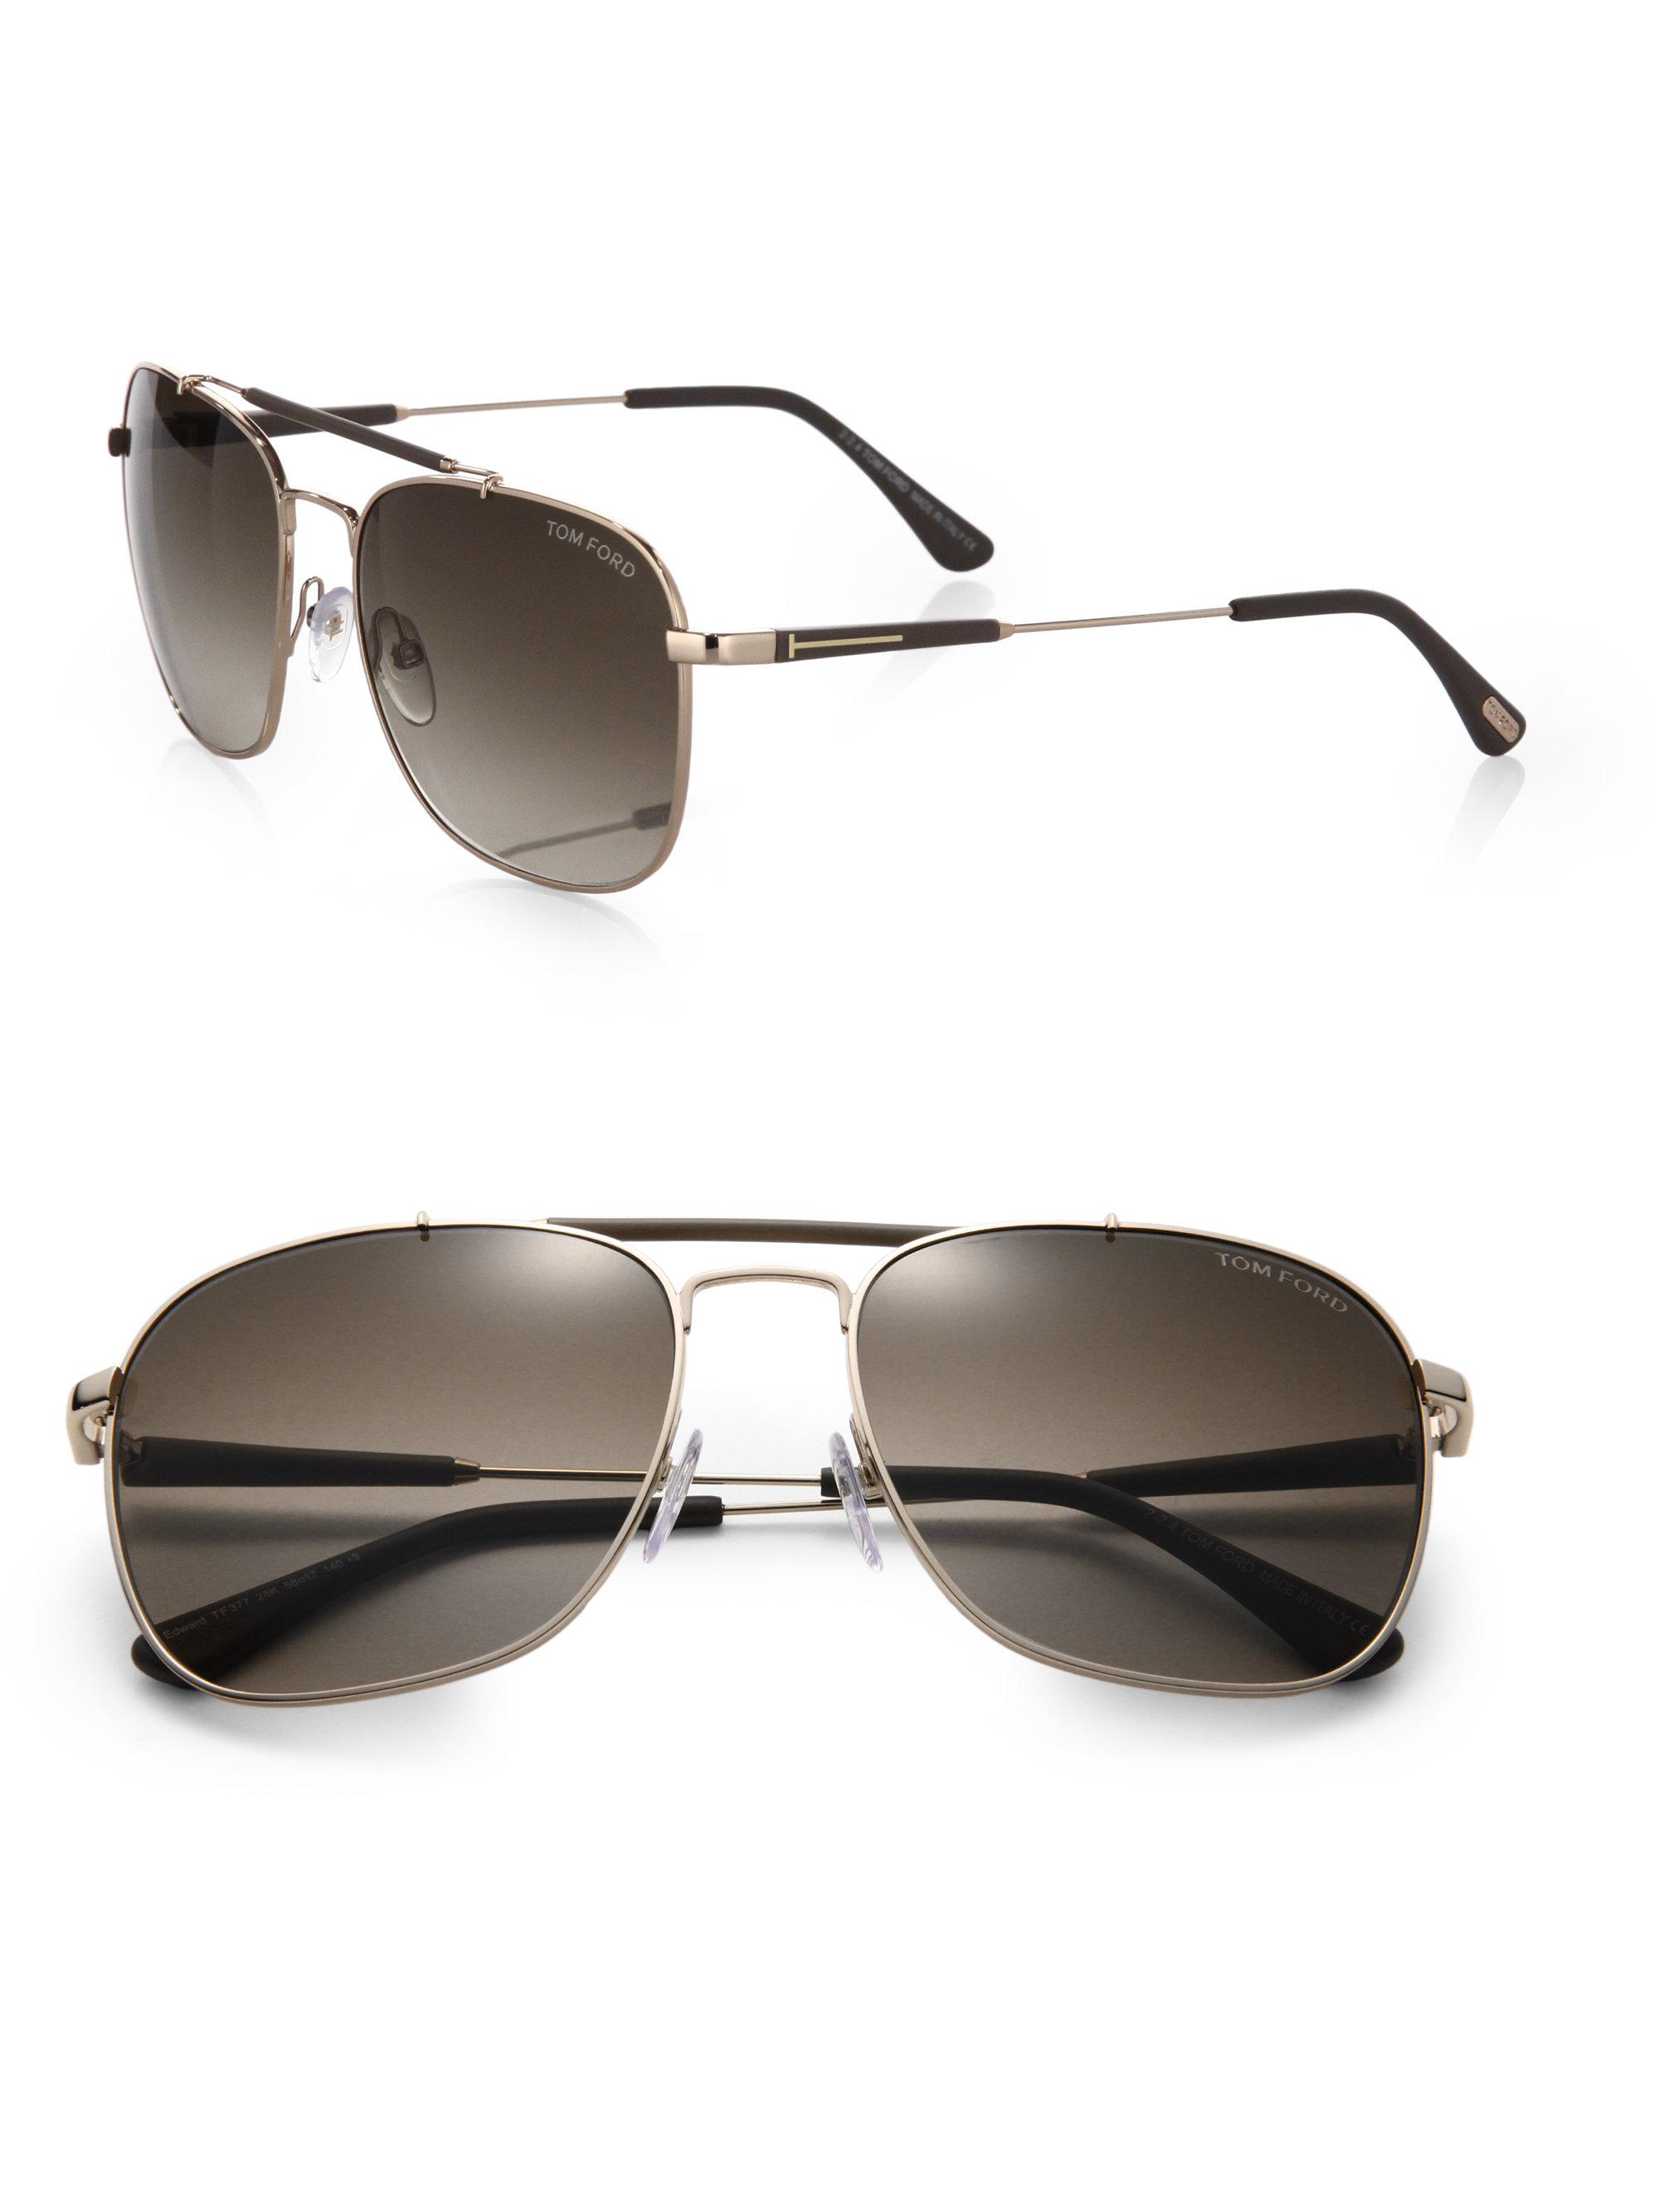 19566bcce832 Tom Ford Jack Sunglasses Ebay